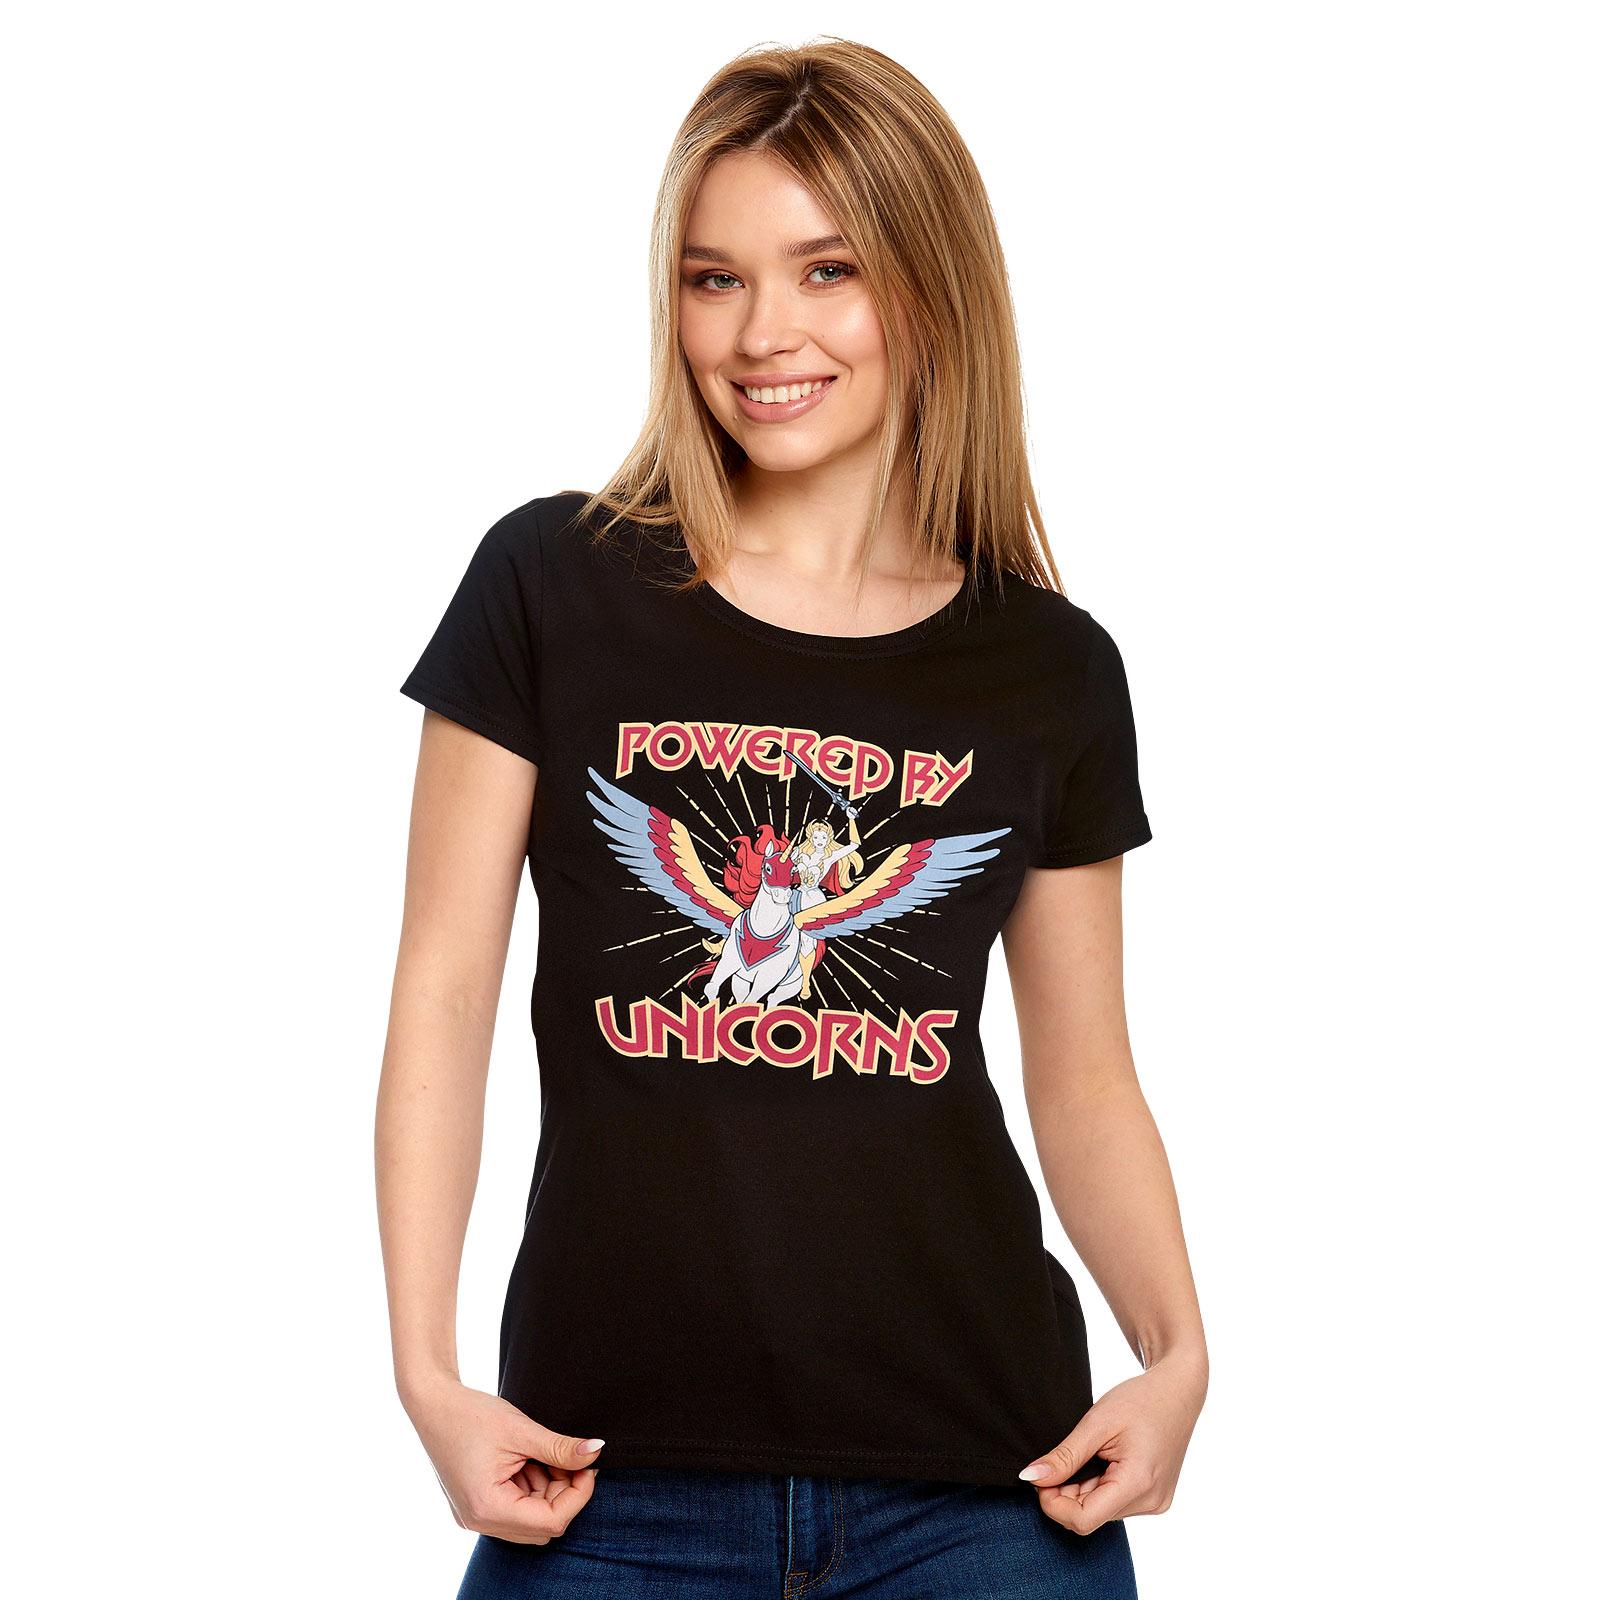 Masters of the Universe - She-Ra Powered by Unicorns T-Shirt Damen